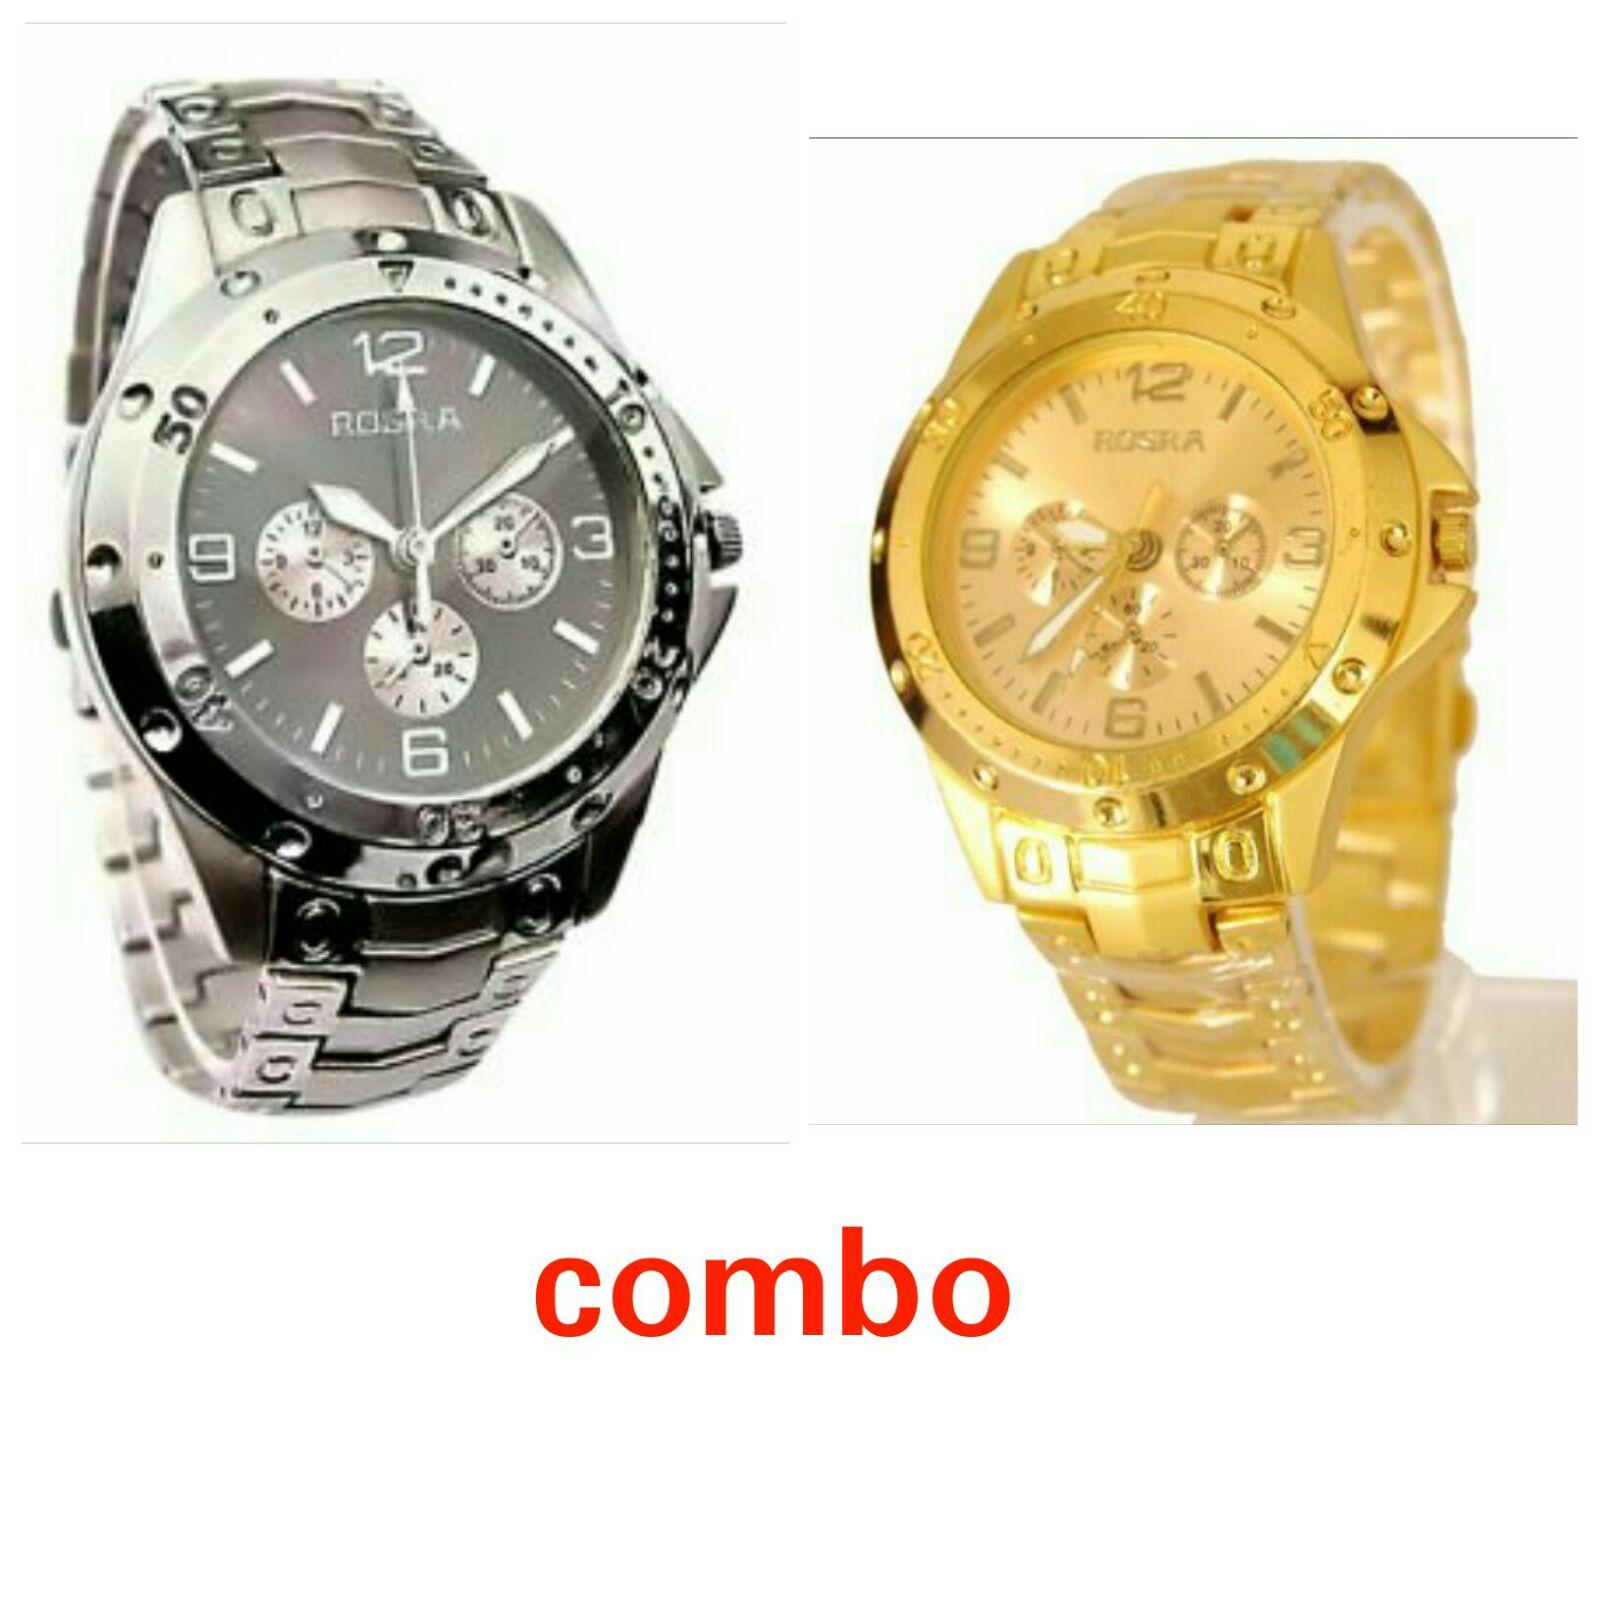 i DIVAS rosra watch   offer combo ANALOG WATCH FOR MEN BOYS